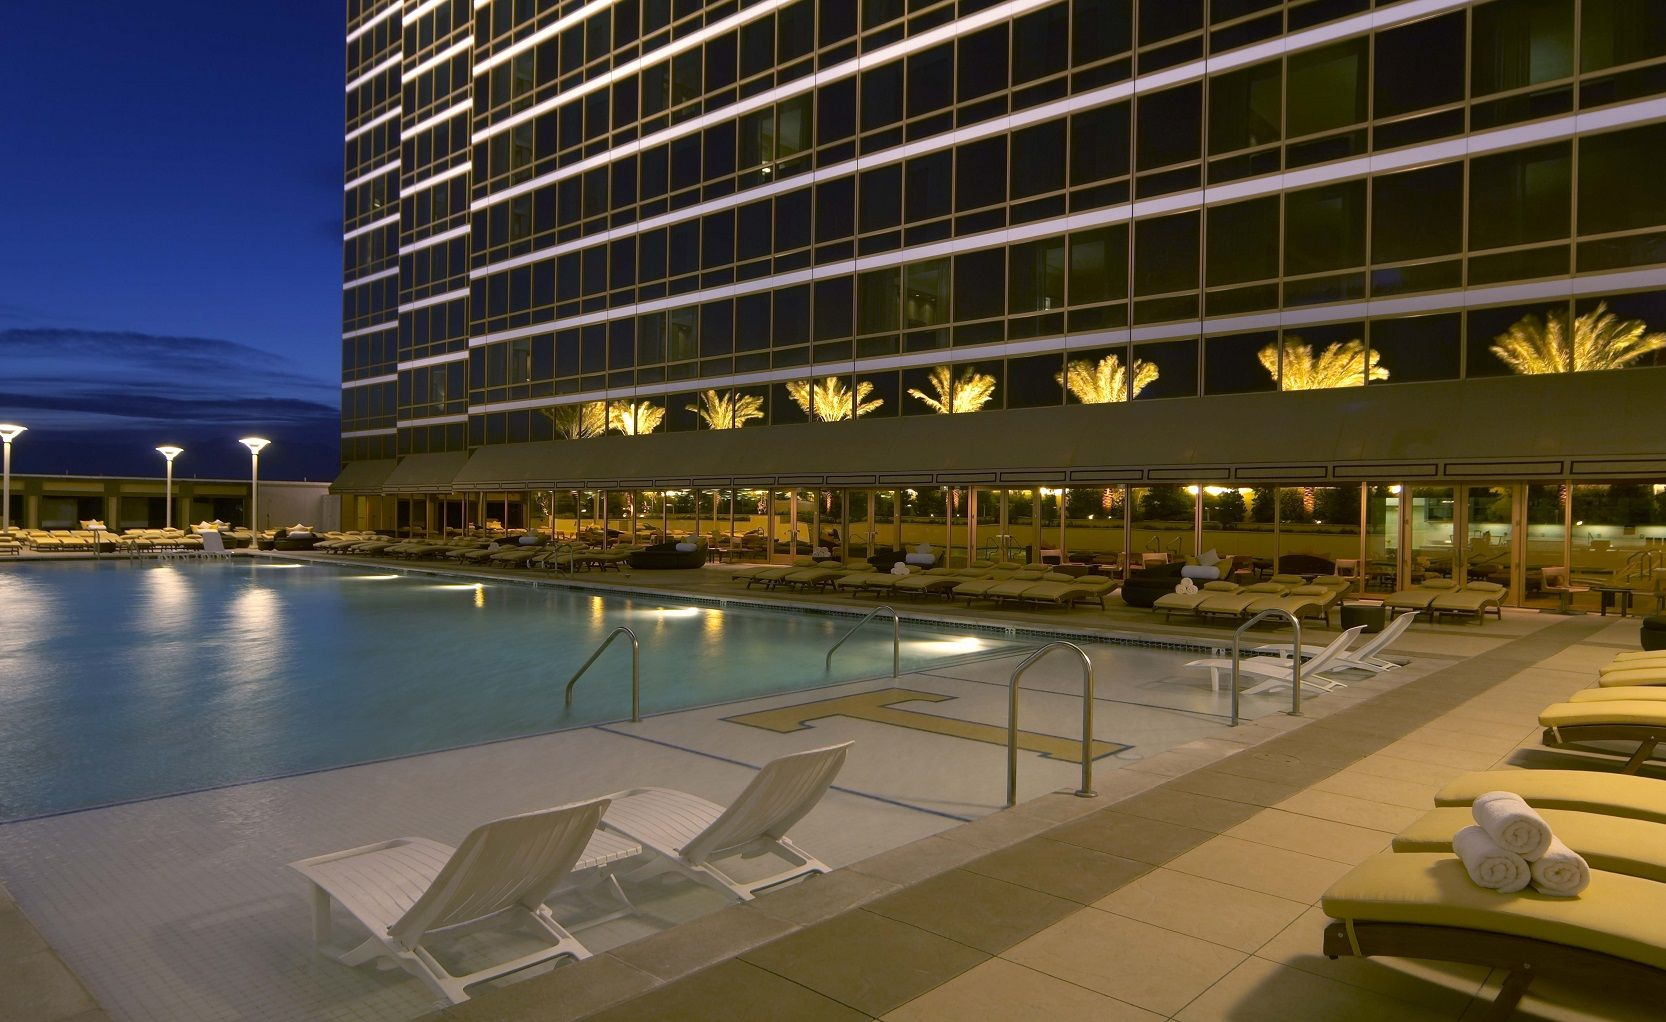 Trump Vegas poolside at night